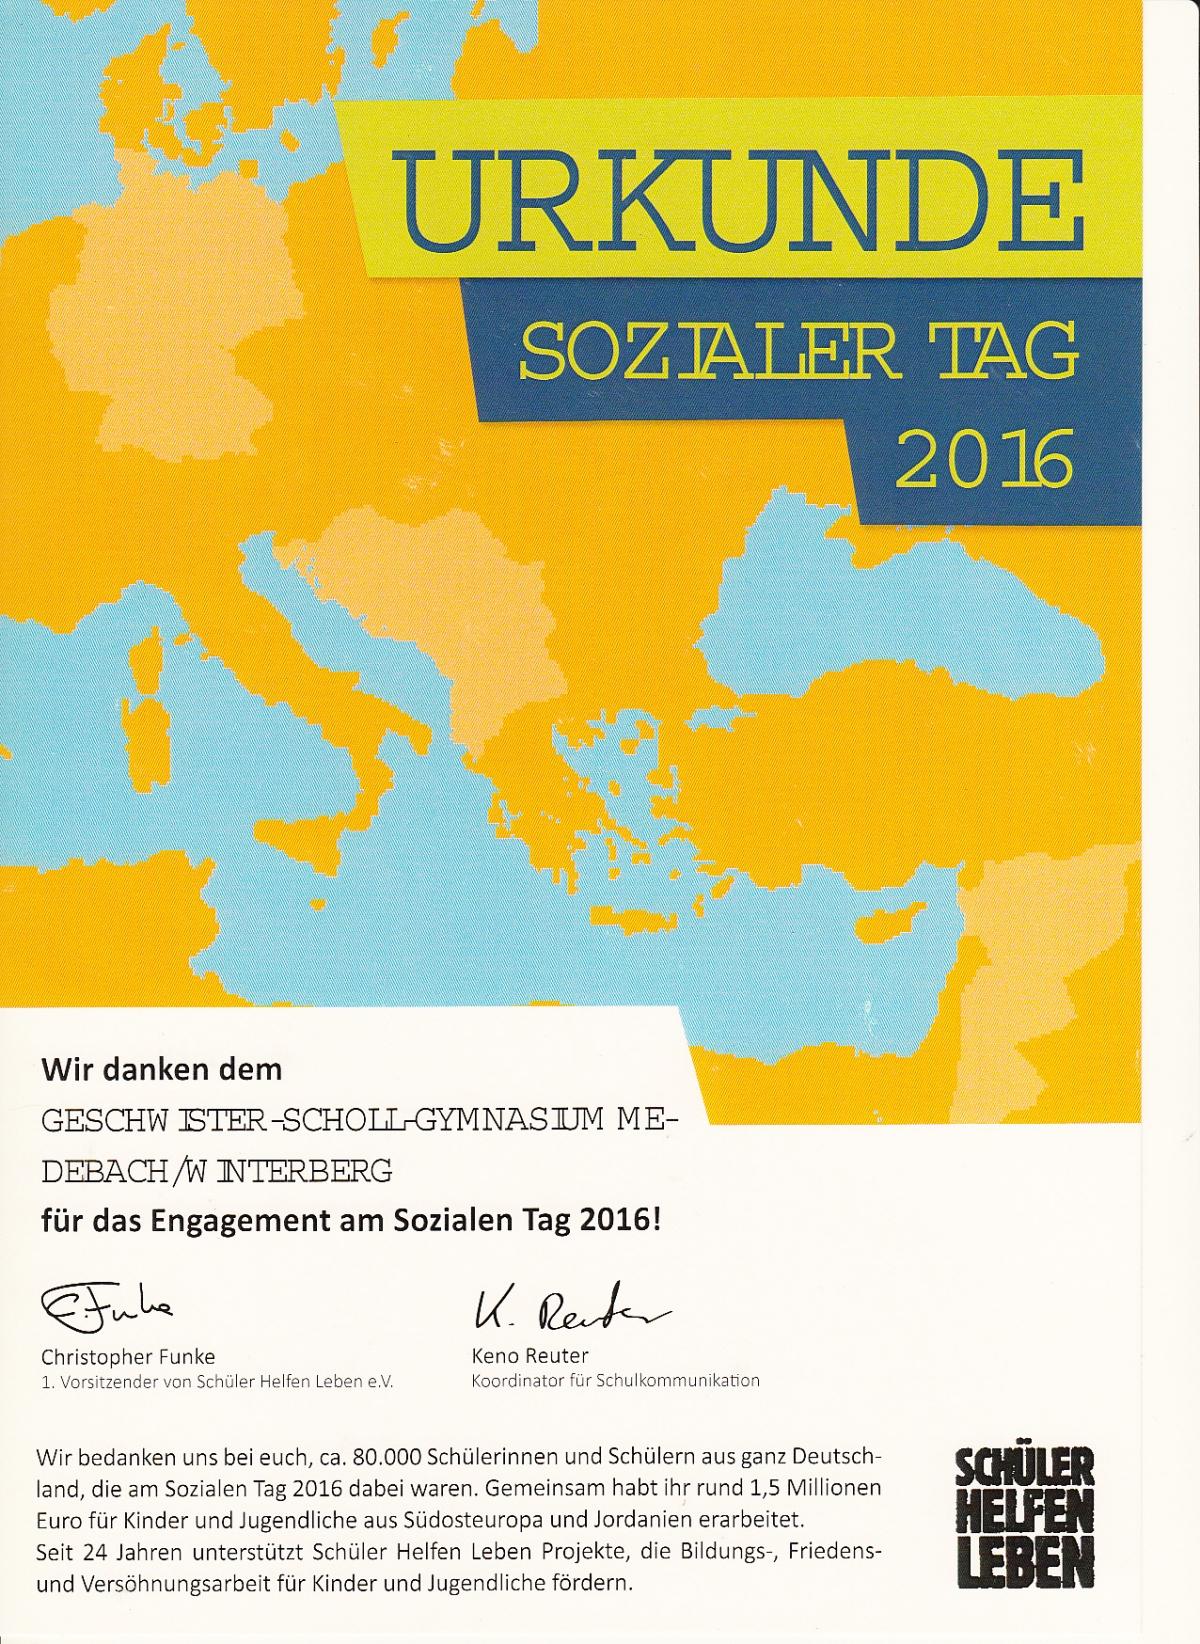 Teilnahme am sozialen Tag 2016